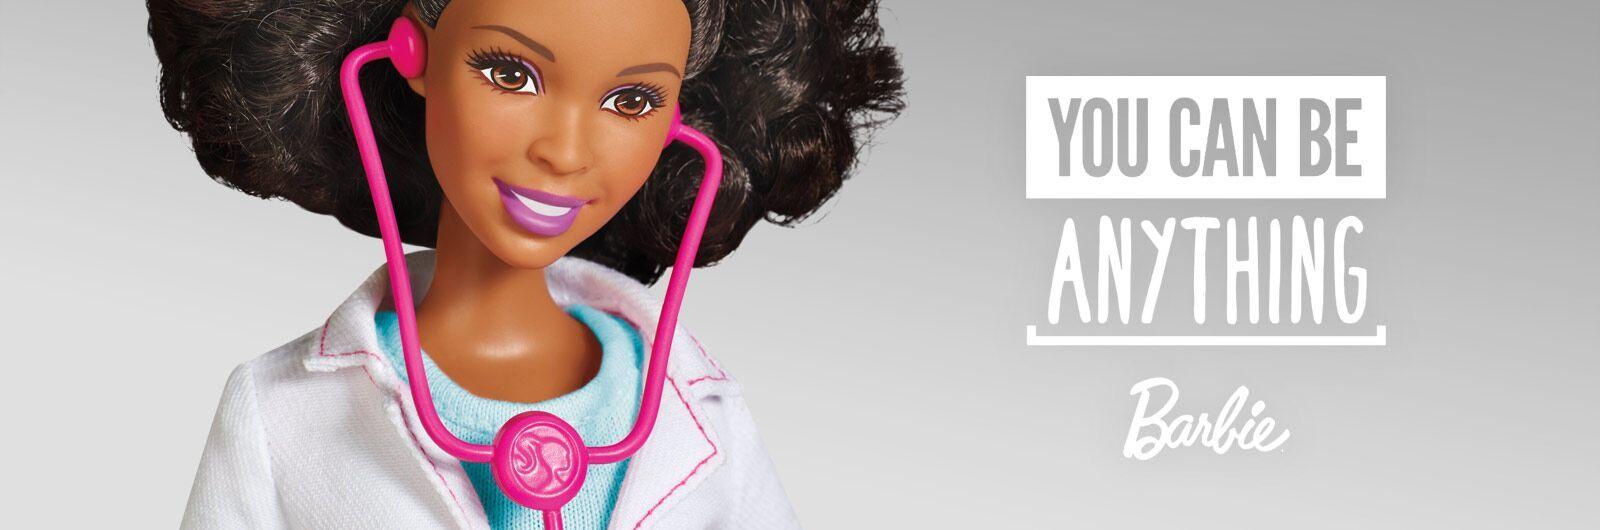 Doctor-barbie-Image.jpeg